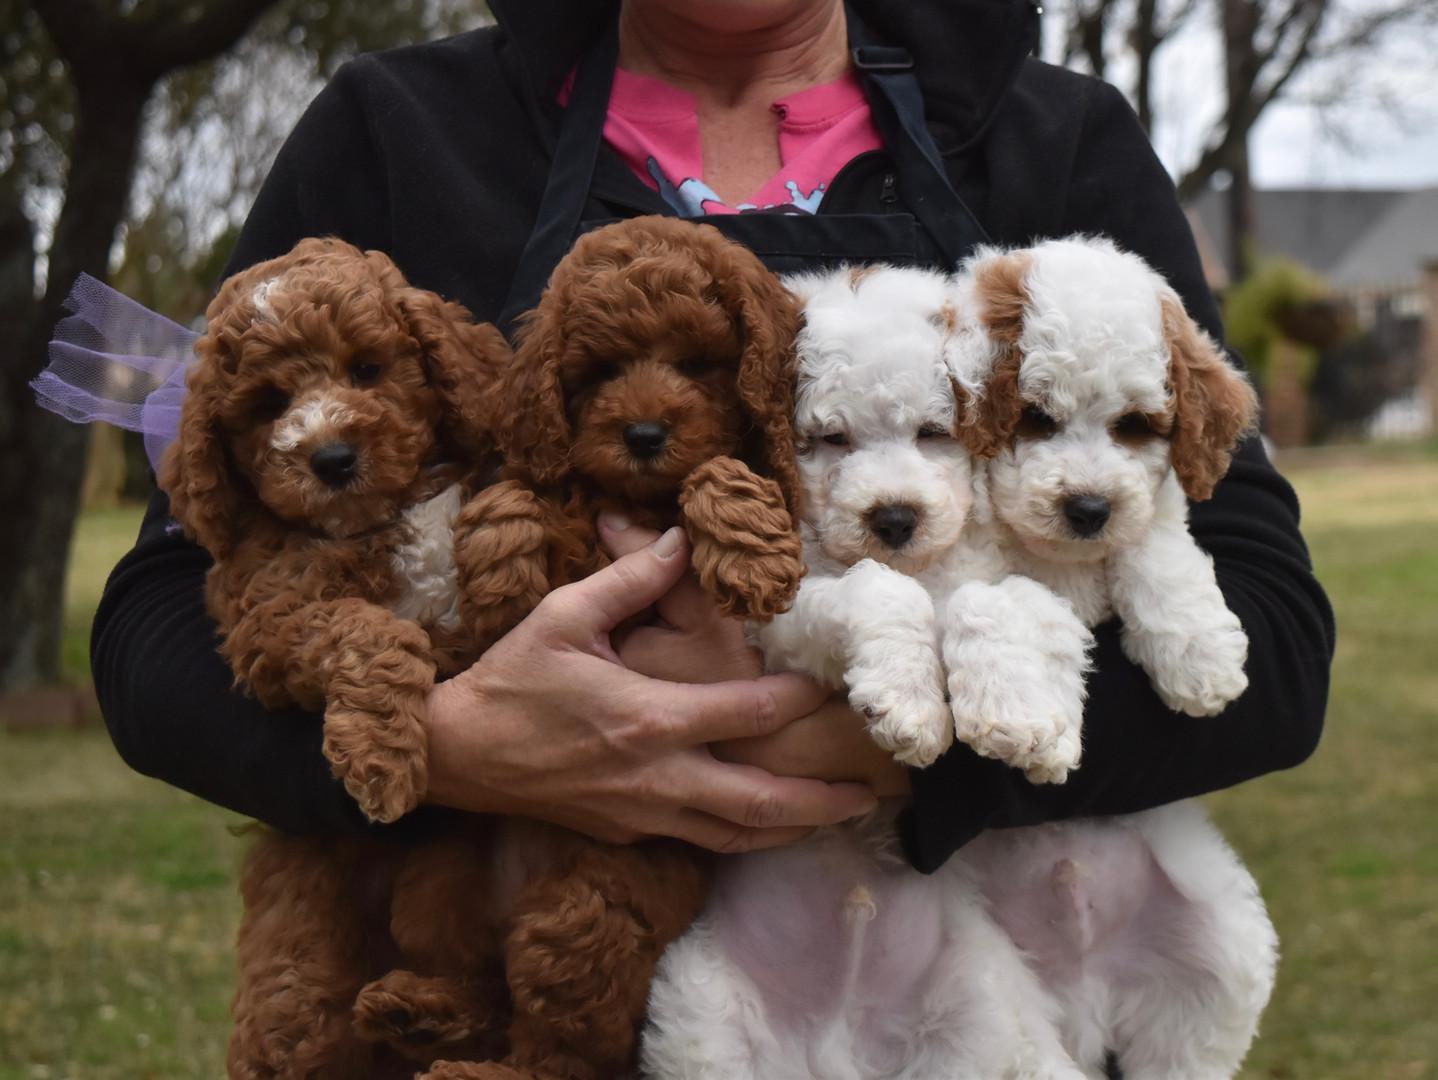 Armful of Precious Poodles